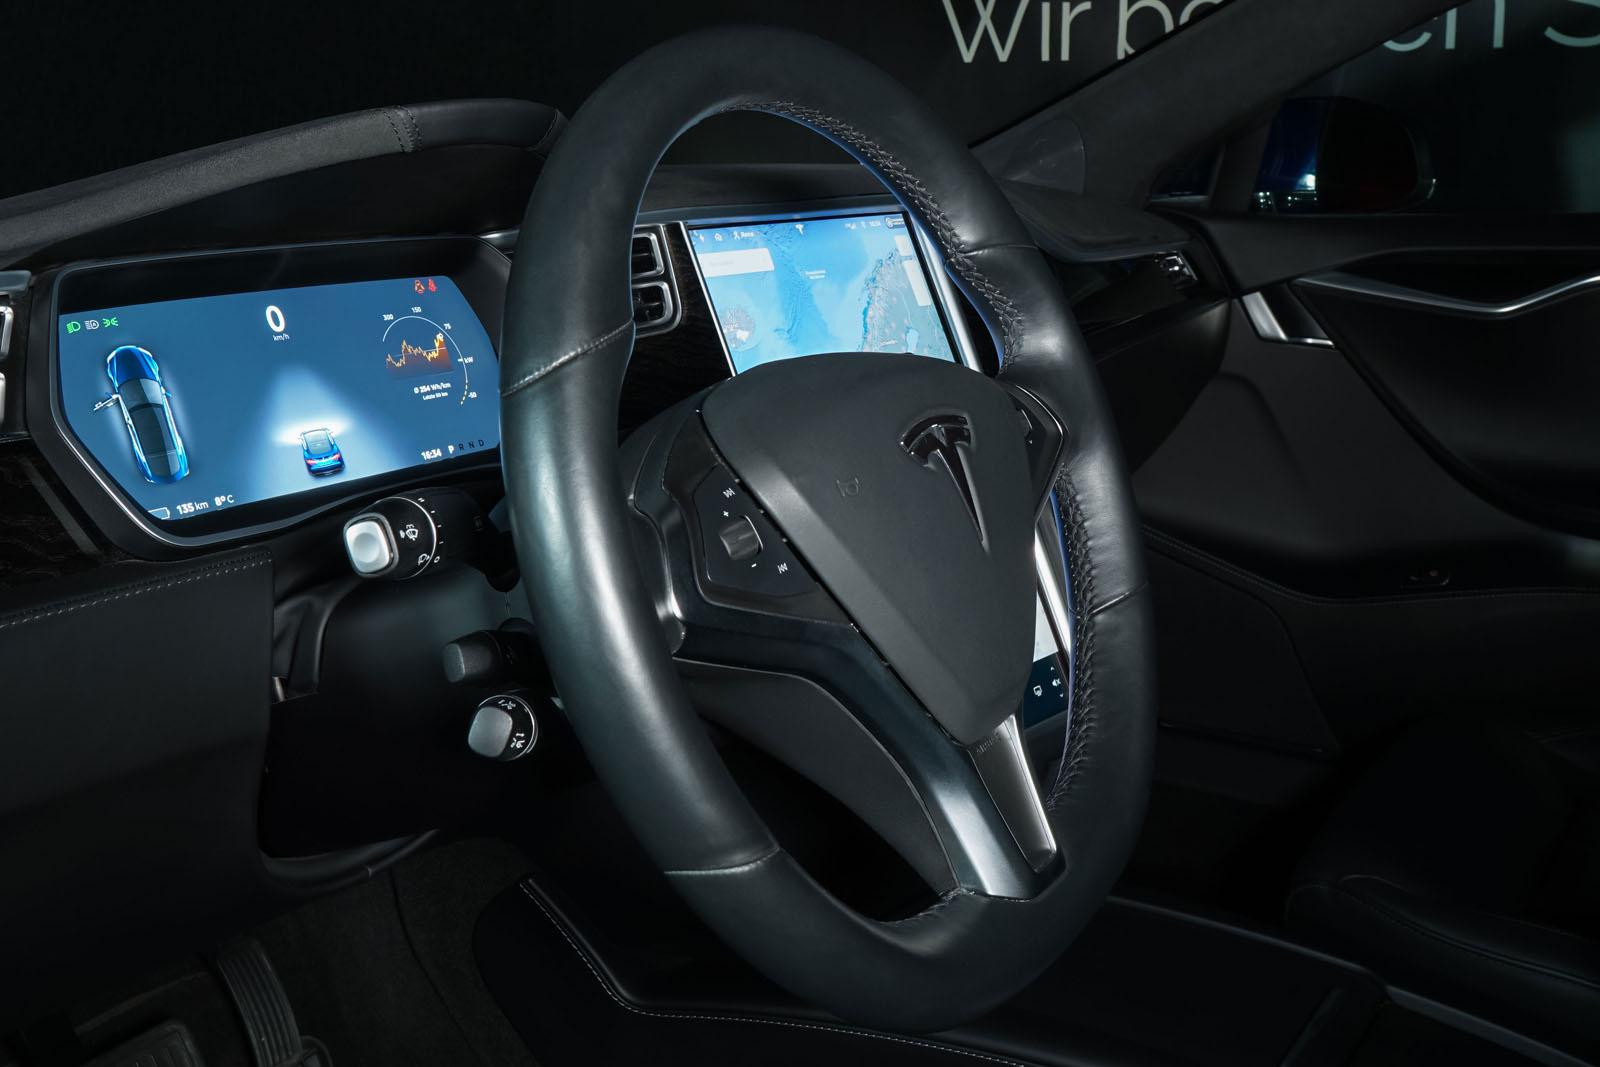 Tesla_ModelS_90D_Blau_Schwarz_Tes-0513_8_w